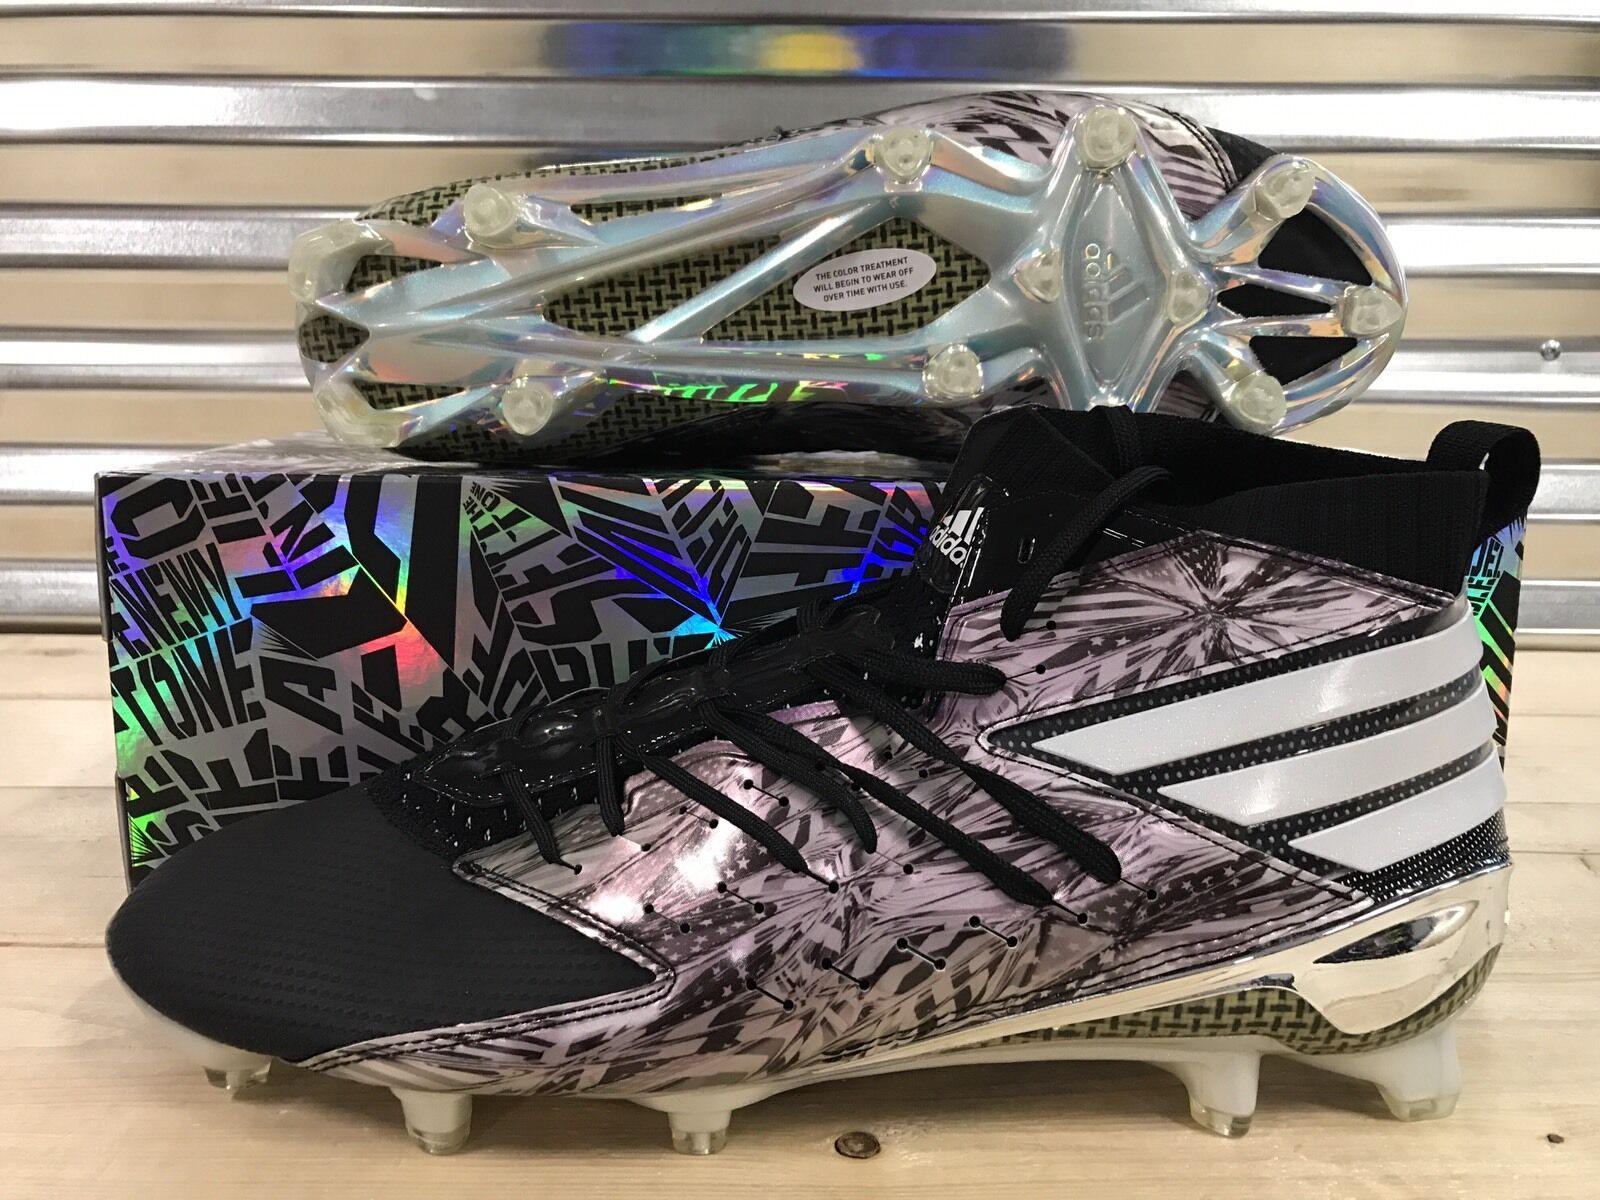 a18551587e6 Adidas Freak X Primeknit Football Cleats Black White Platinum SZ ( AQ8796 )